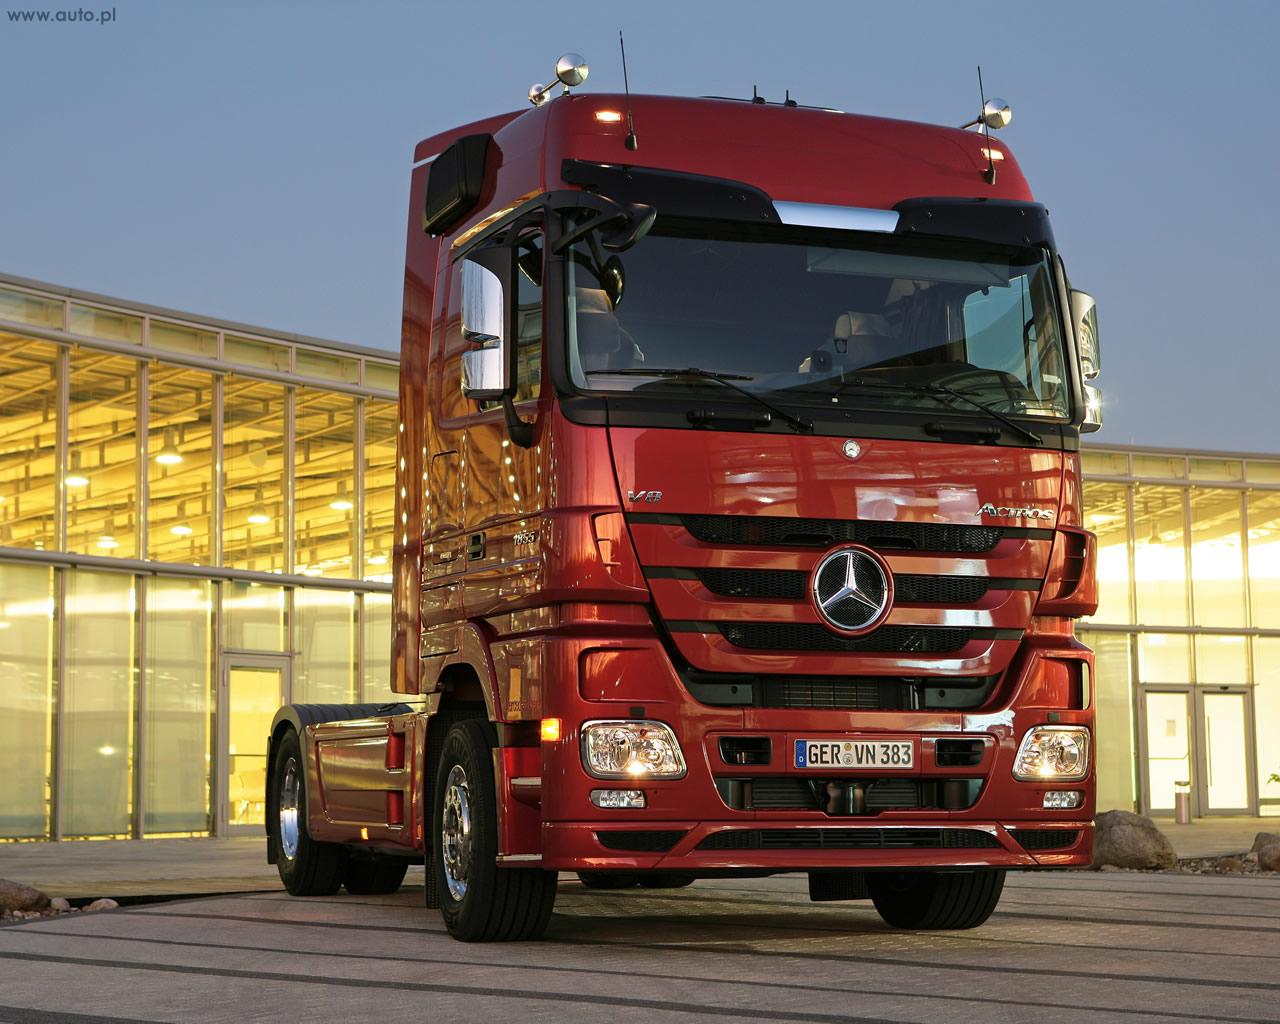 Mercedes-Benz Actros wallpapers, Vehicles, HQ Mercedes-Benz